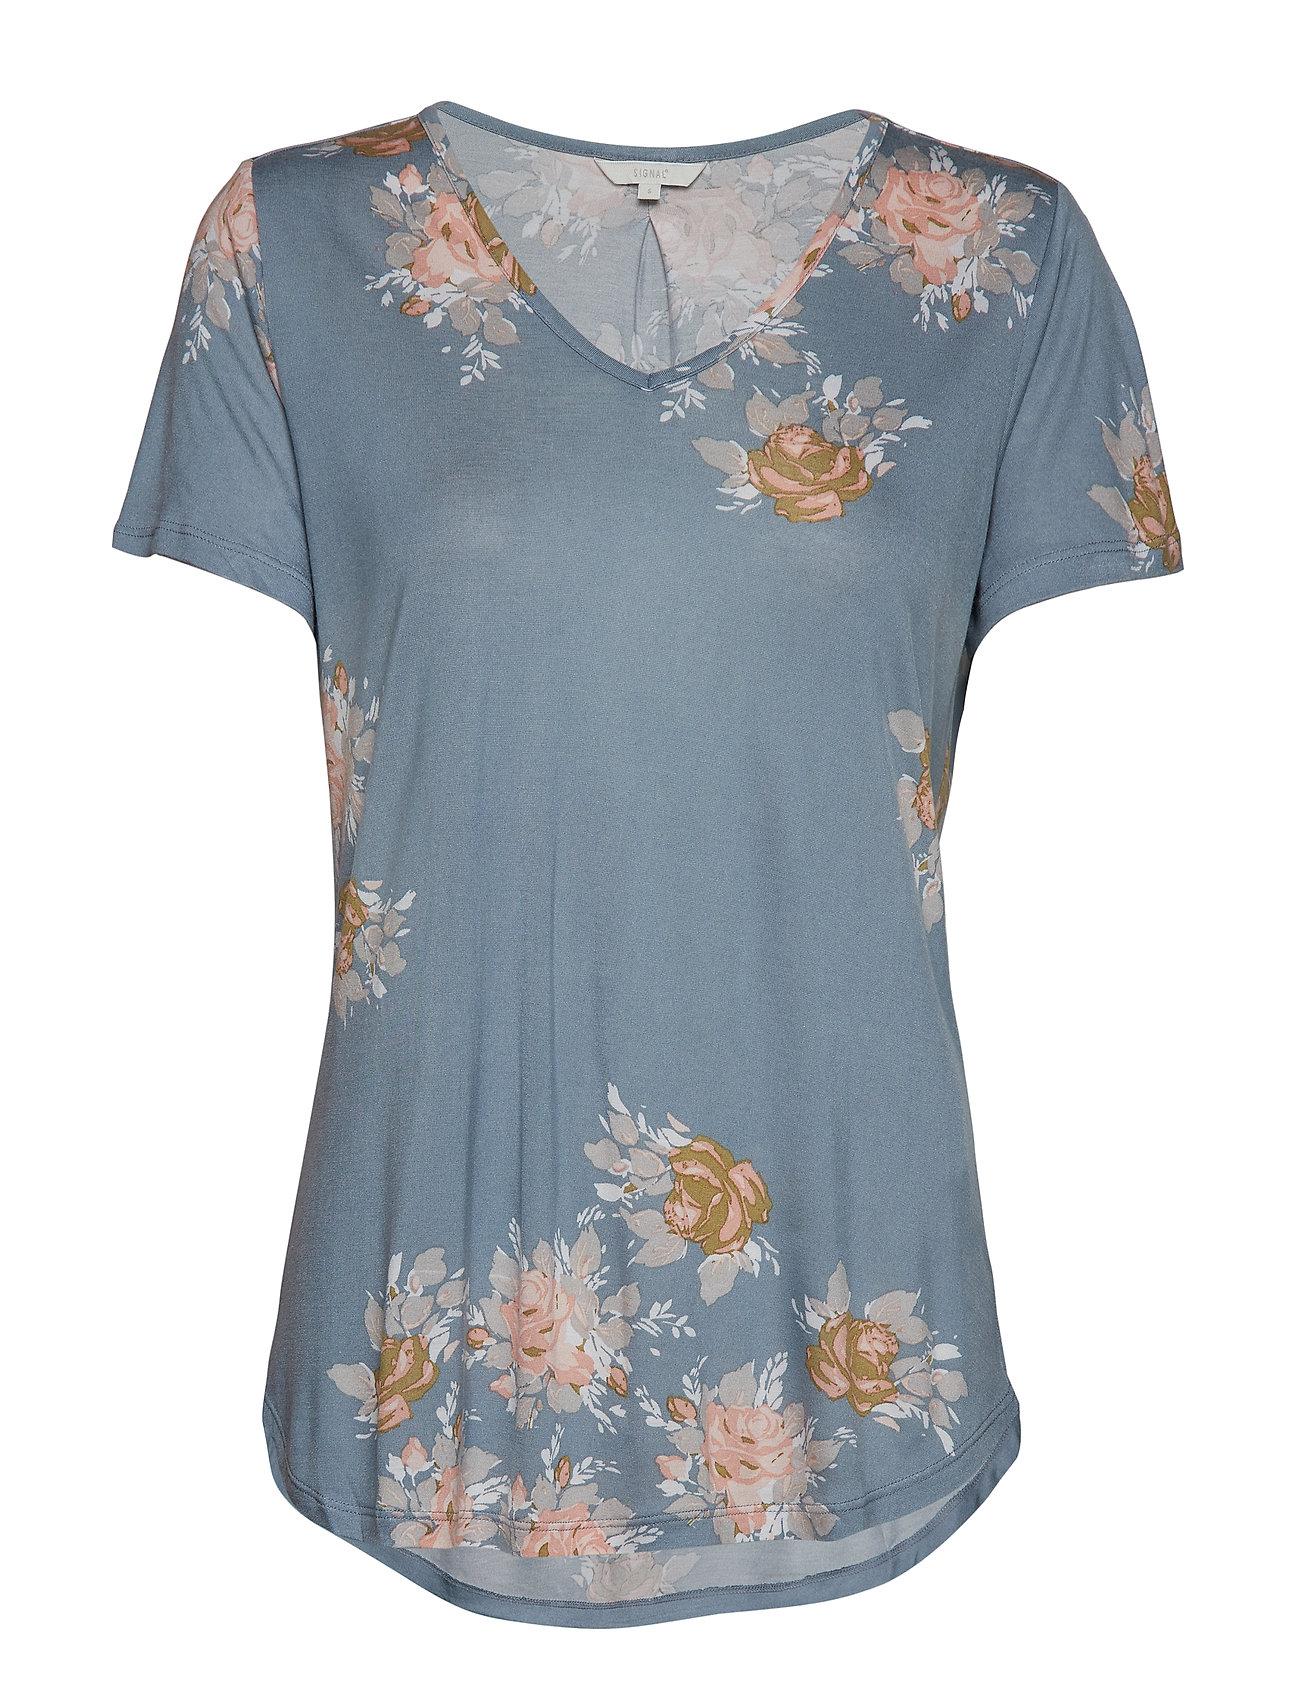 Signal T-shirt/Top - MISTY ROSE